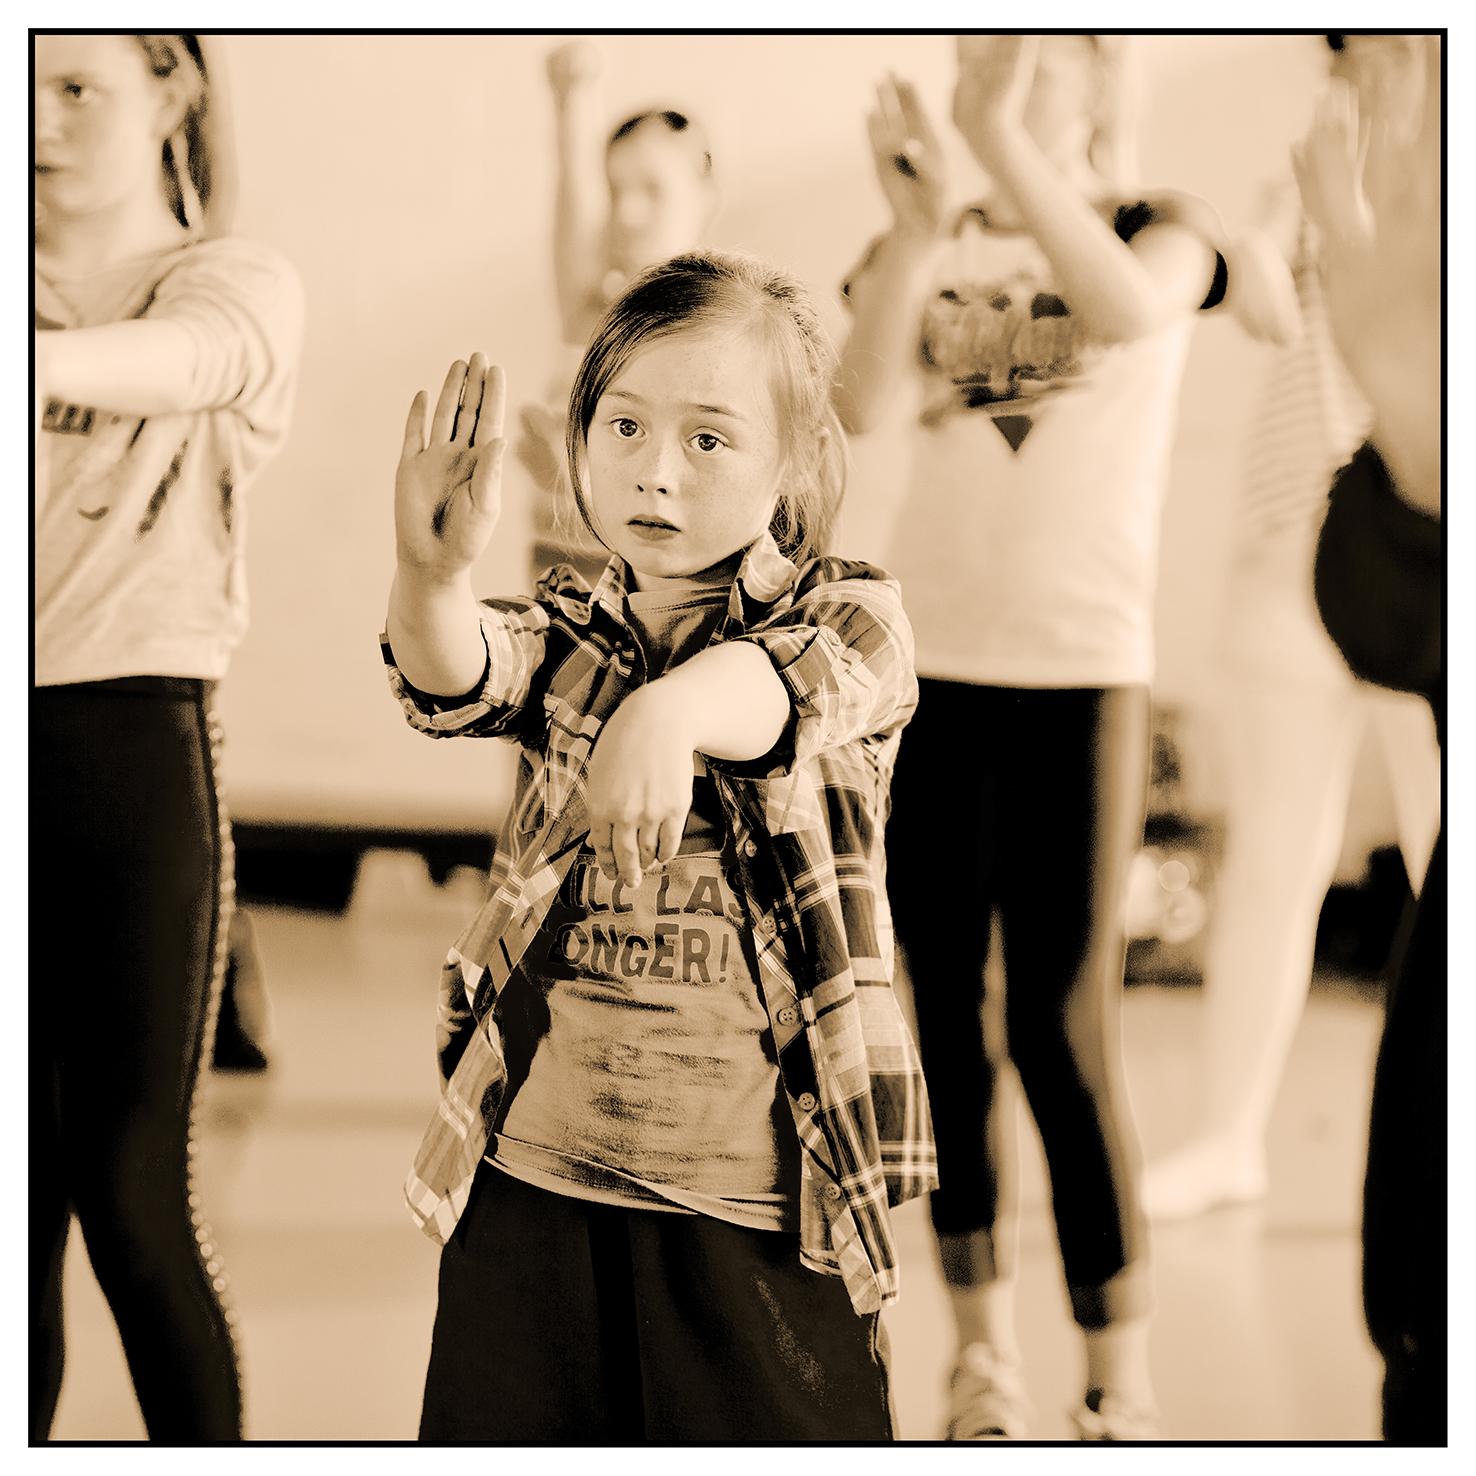 DancerB0074.jpg